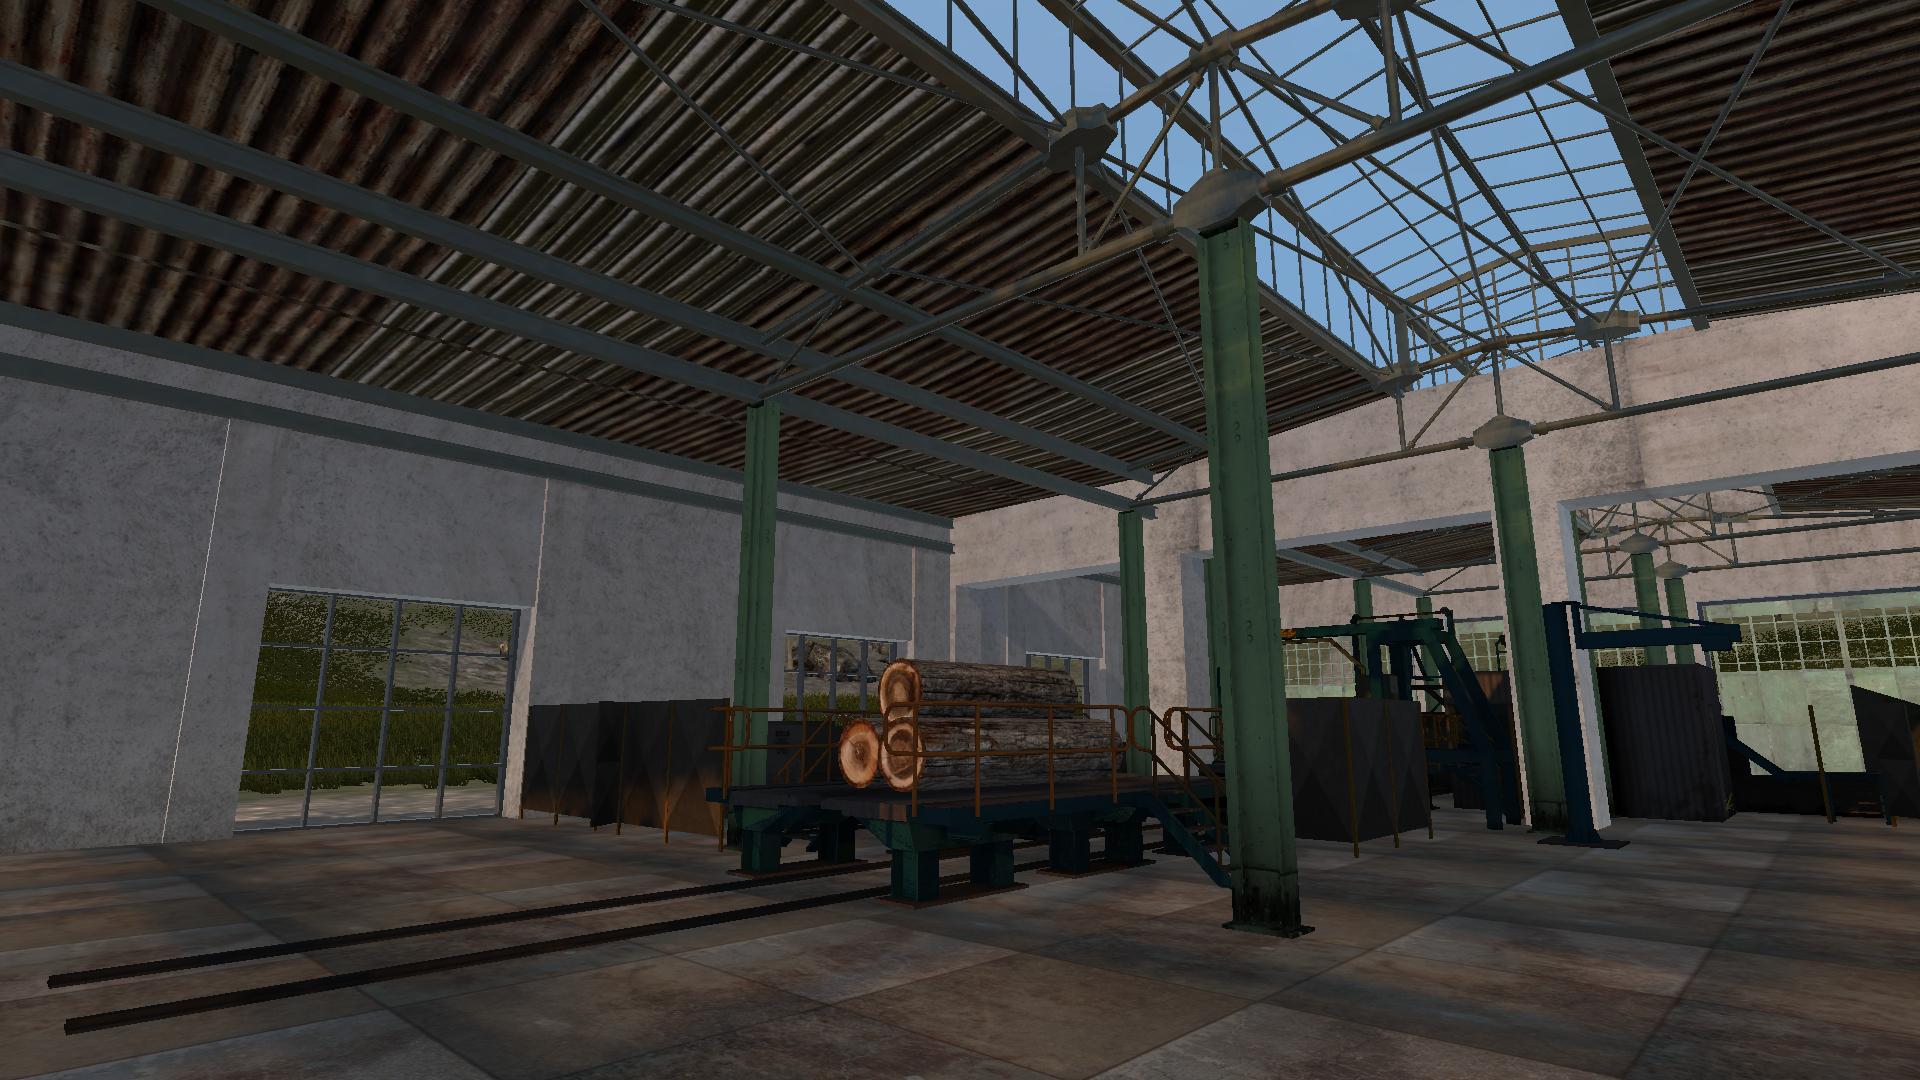 Bandai Namco To Publish Farming And Woodcutting Simulators